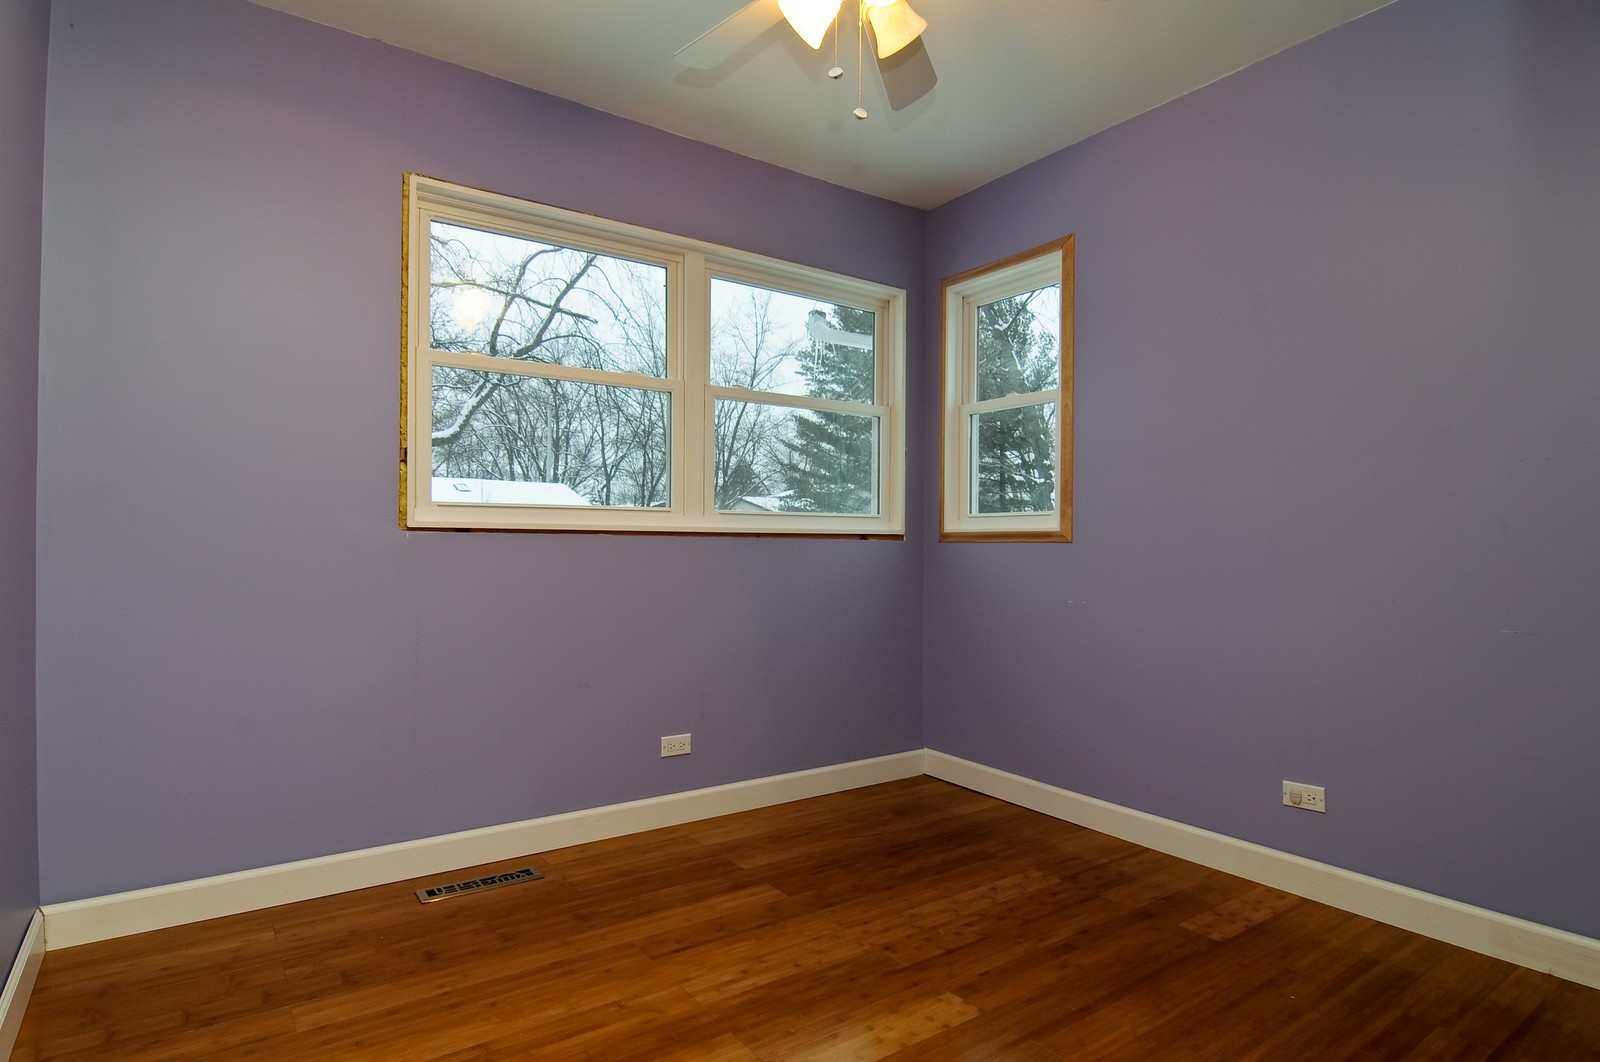 Real Estate Photography - 18648 W Pamela Pl, Gurnee, IL, 60031 - Location 1